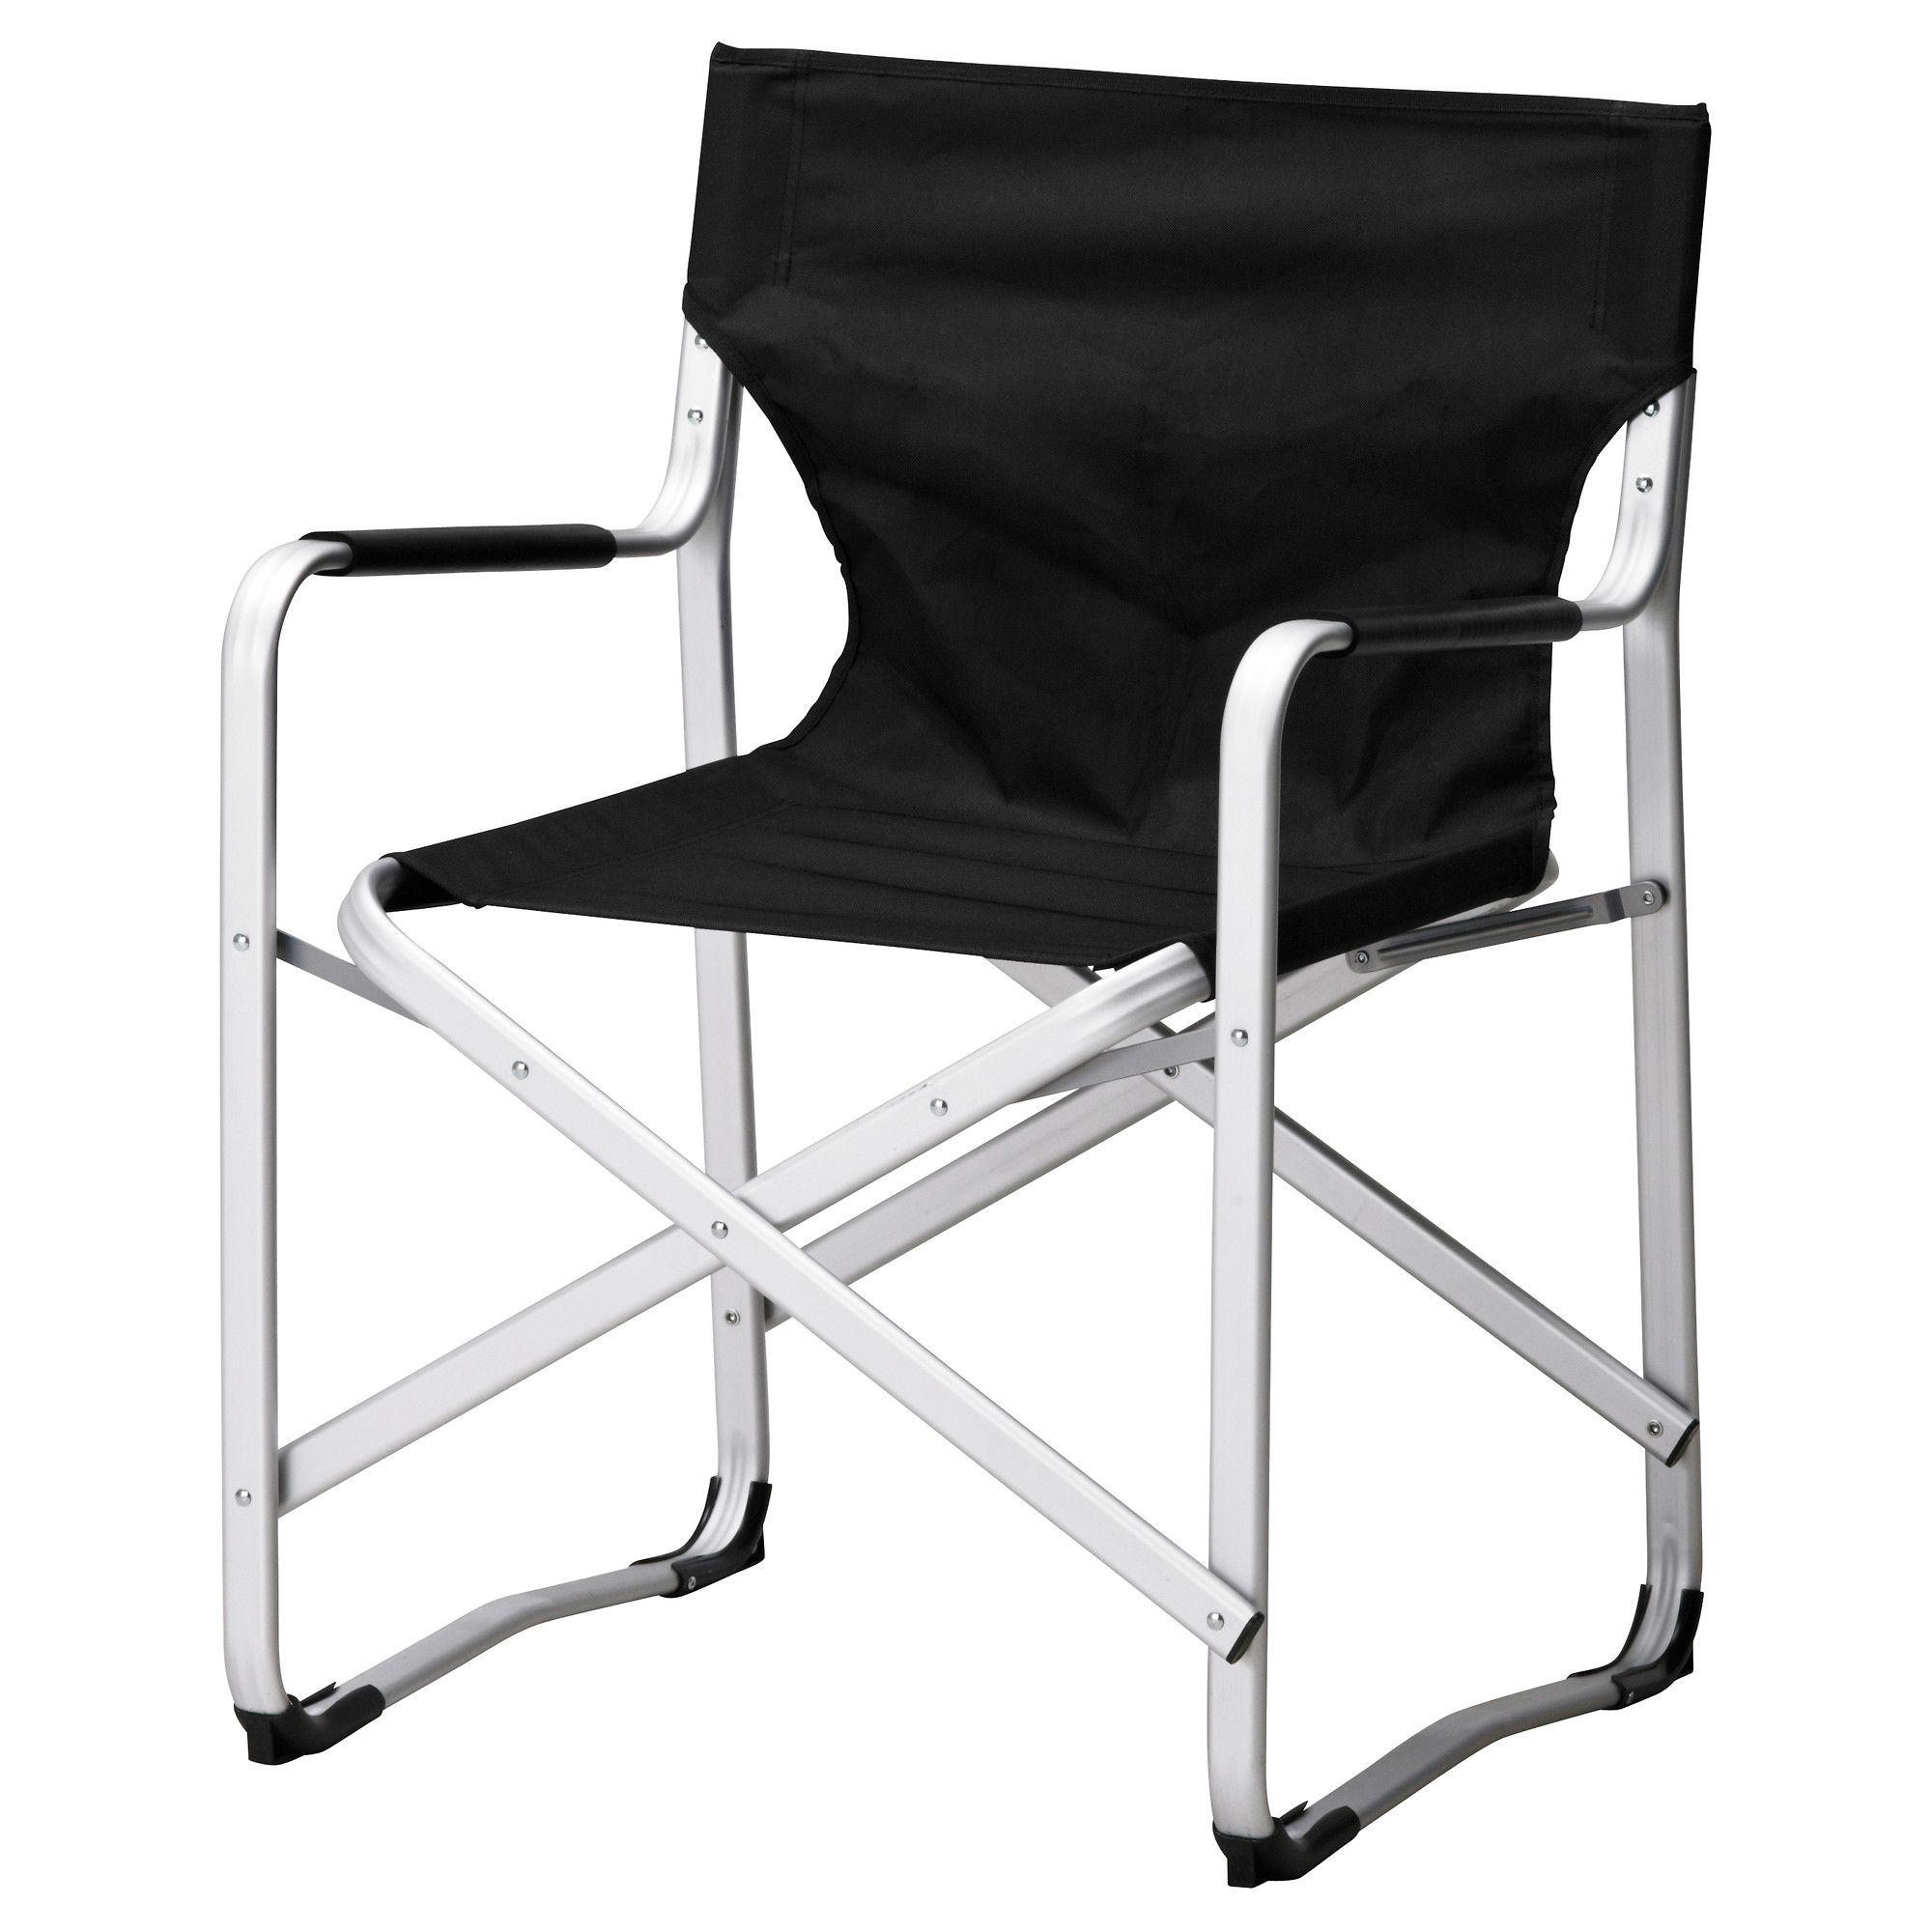 Deck Chairs Ikea Uk